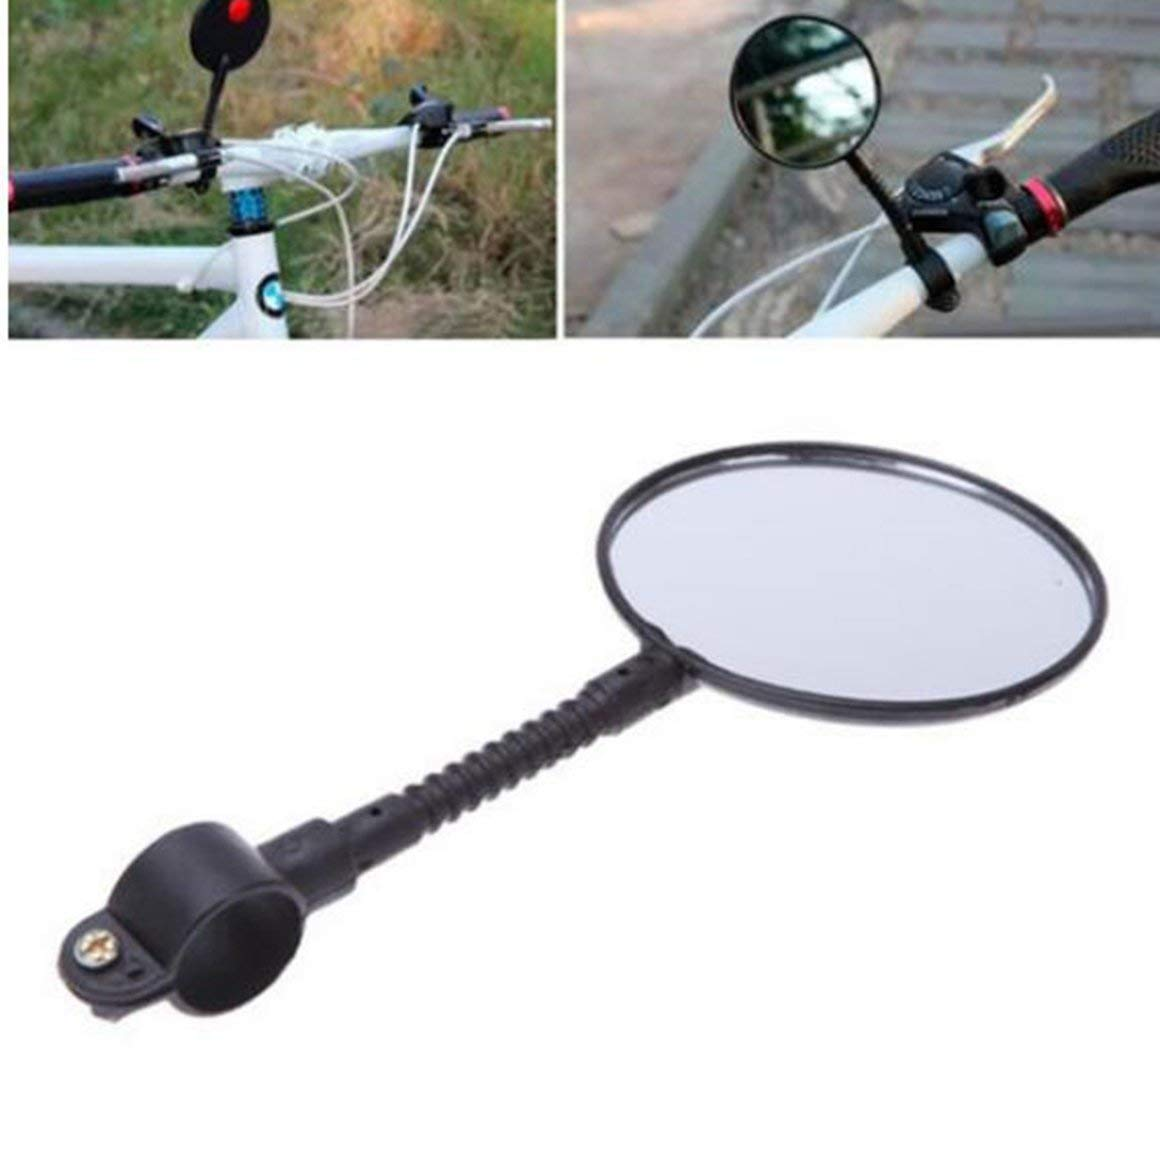 Funnyrunstore Adjustable Rotatable Cycling Mountain Road Bike Motorcycle Bicycle Rear View Mirror Handlebar Rearview Mirror Black